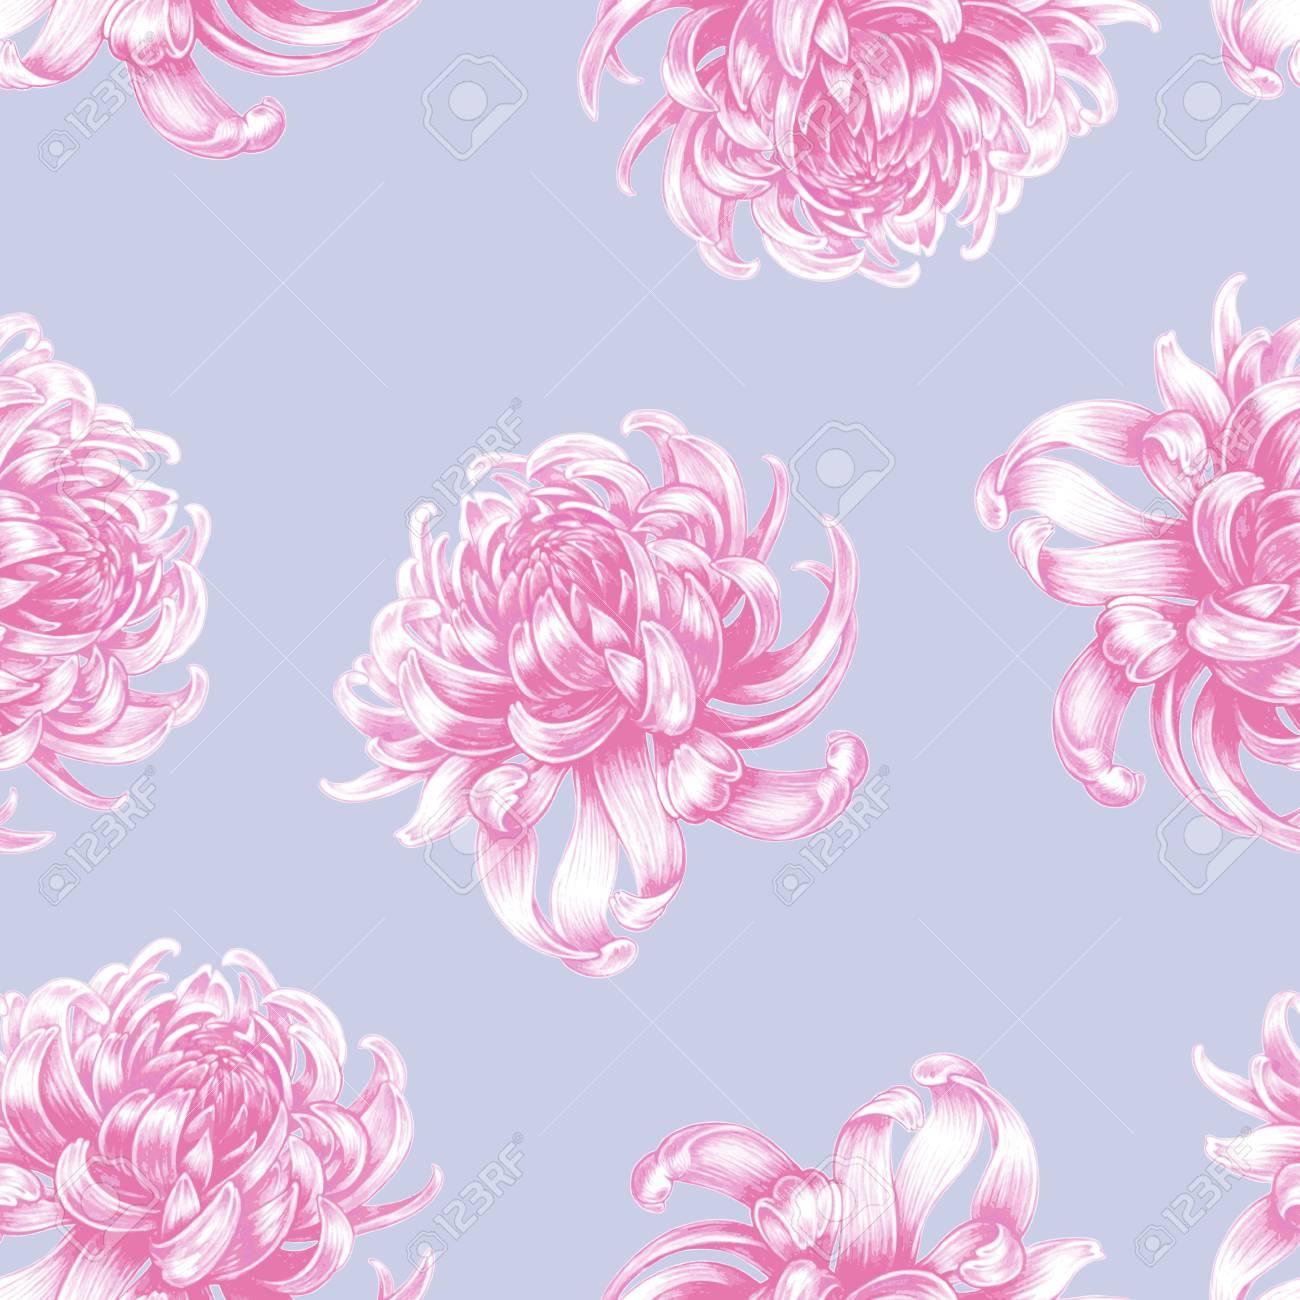 Vector Seamless Background Chrysanthemum Flowers Design For